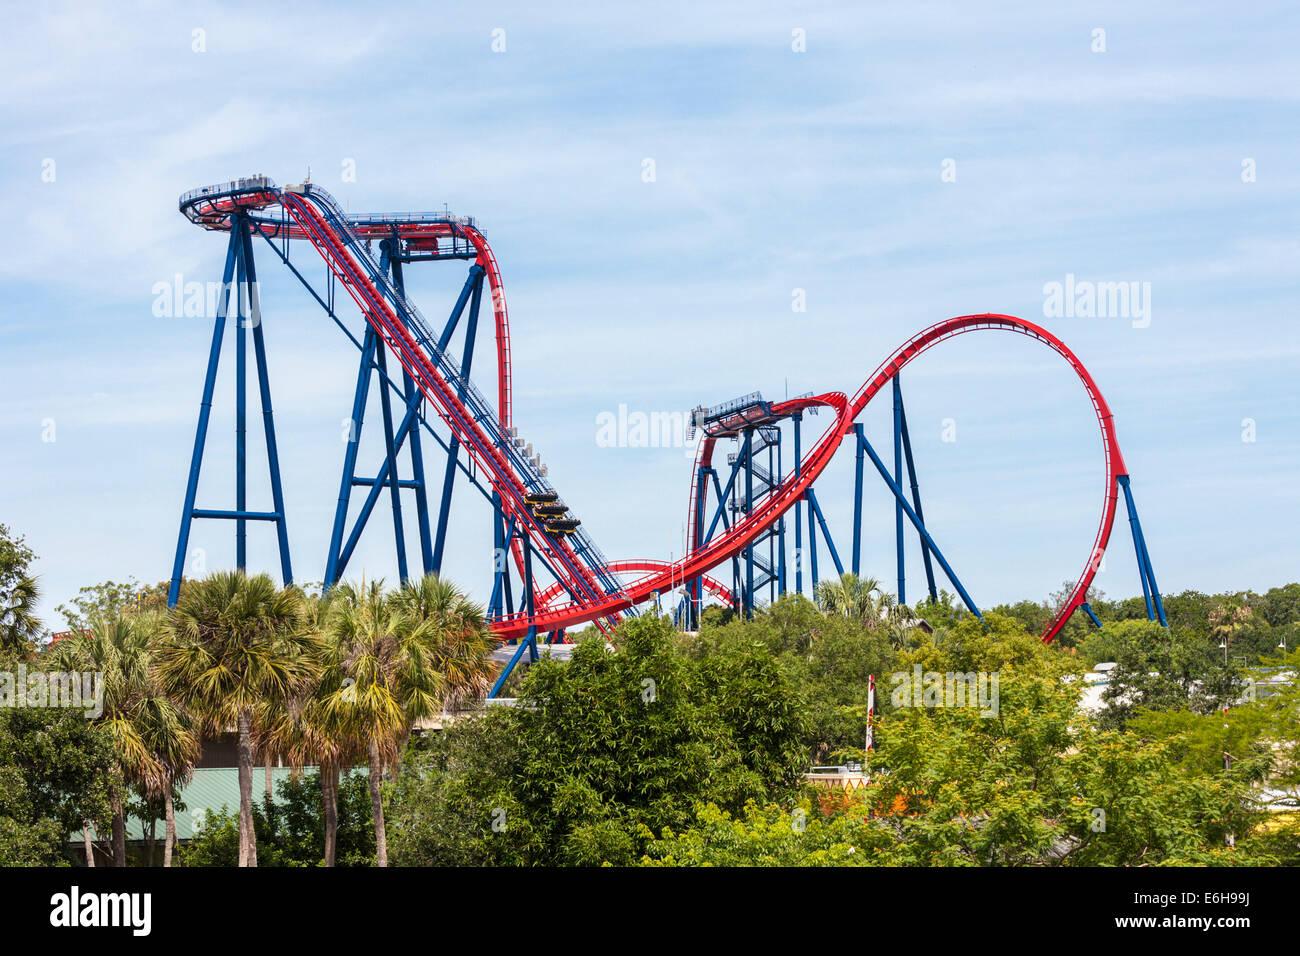 Sheikra Roller Coaster At Busch Gardens Theme Park In Tampa Florida Stock Photo Royalty Free